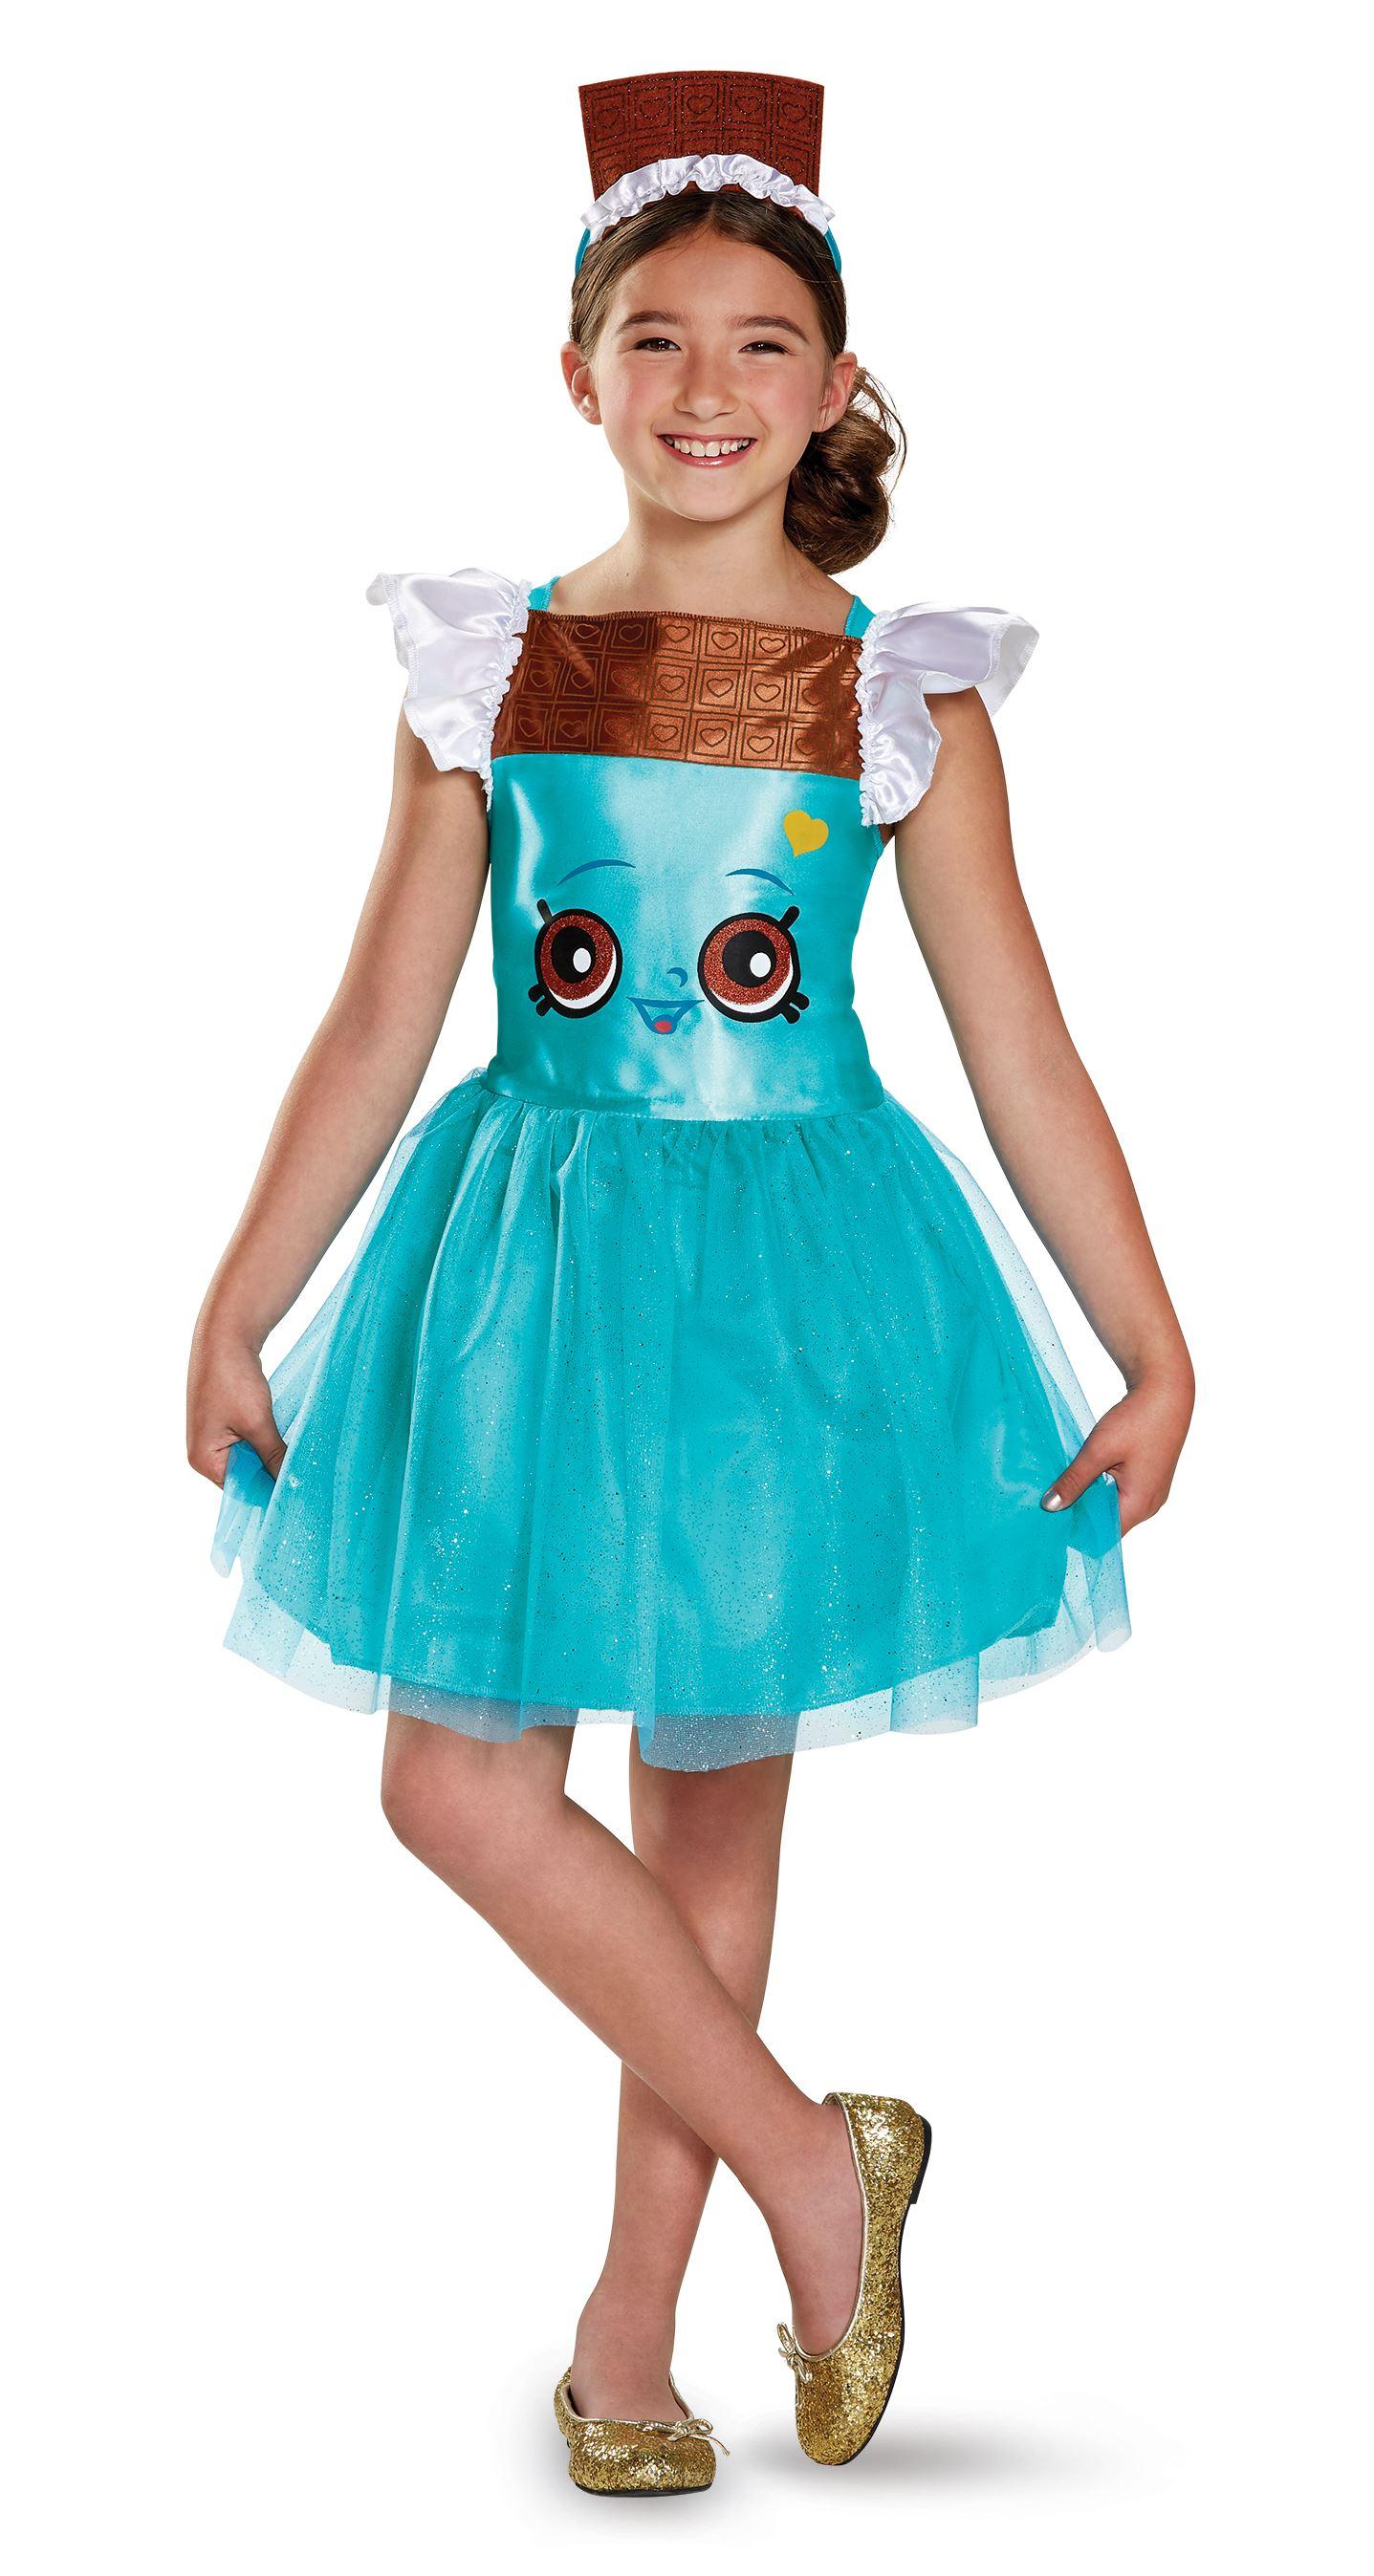 kids cheeky chocolate shopkins girls costume 23 99 the costume land